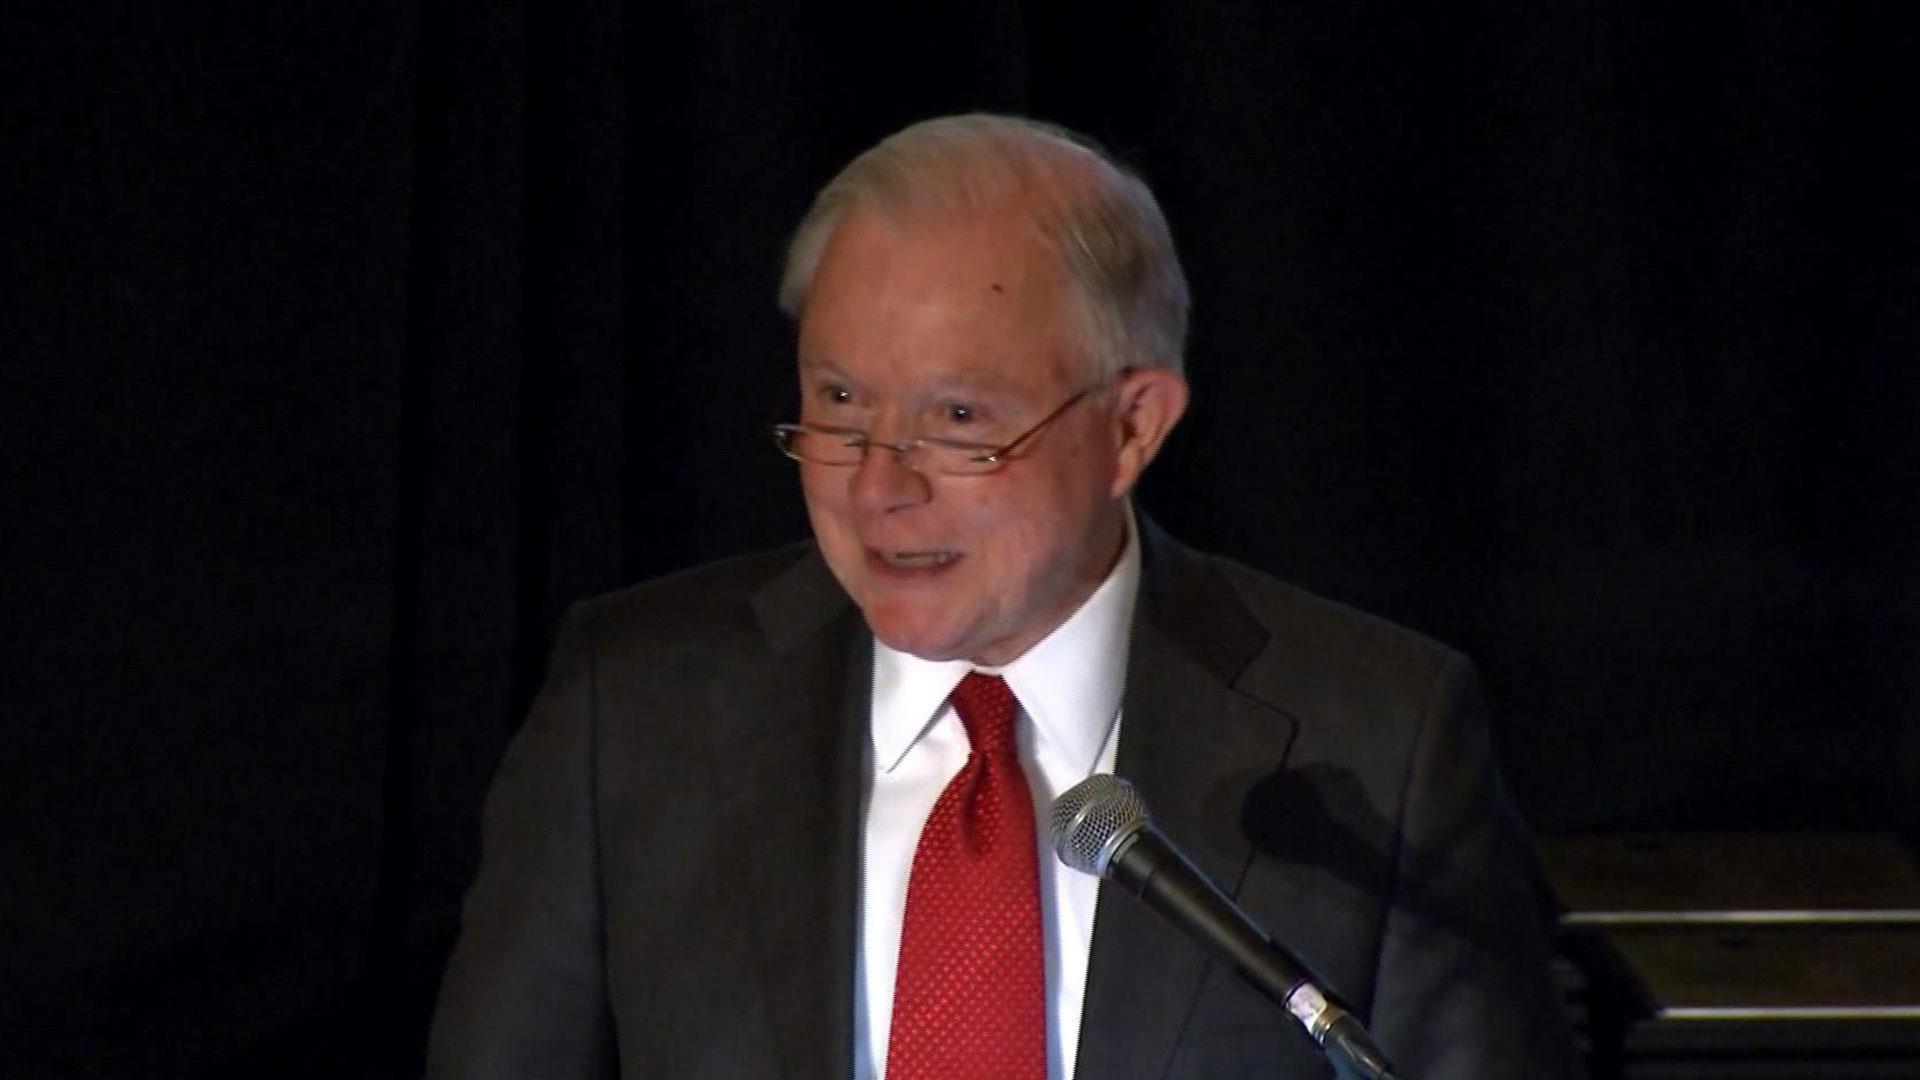 Fmr. U.S. Attorney General Jeff Sessions calls resignation pink slip